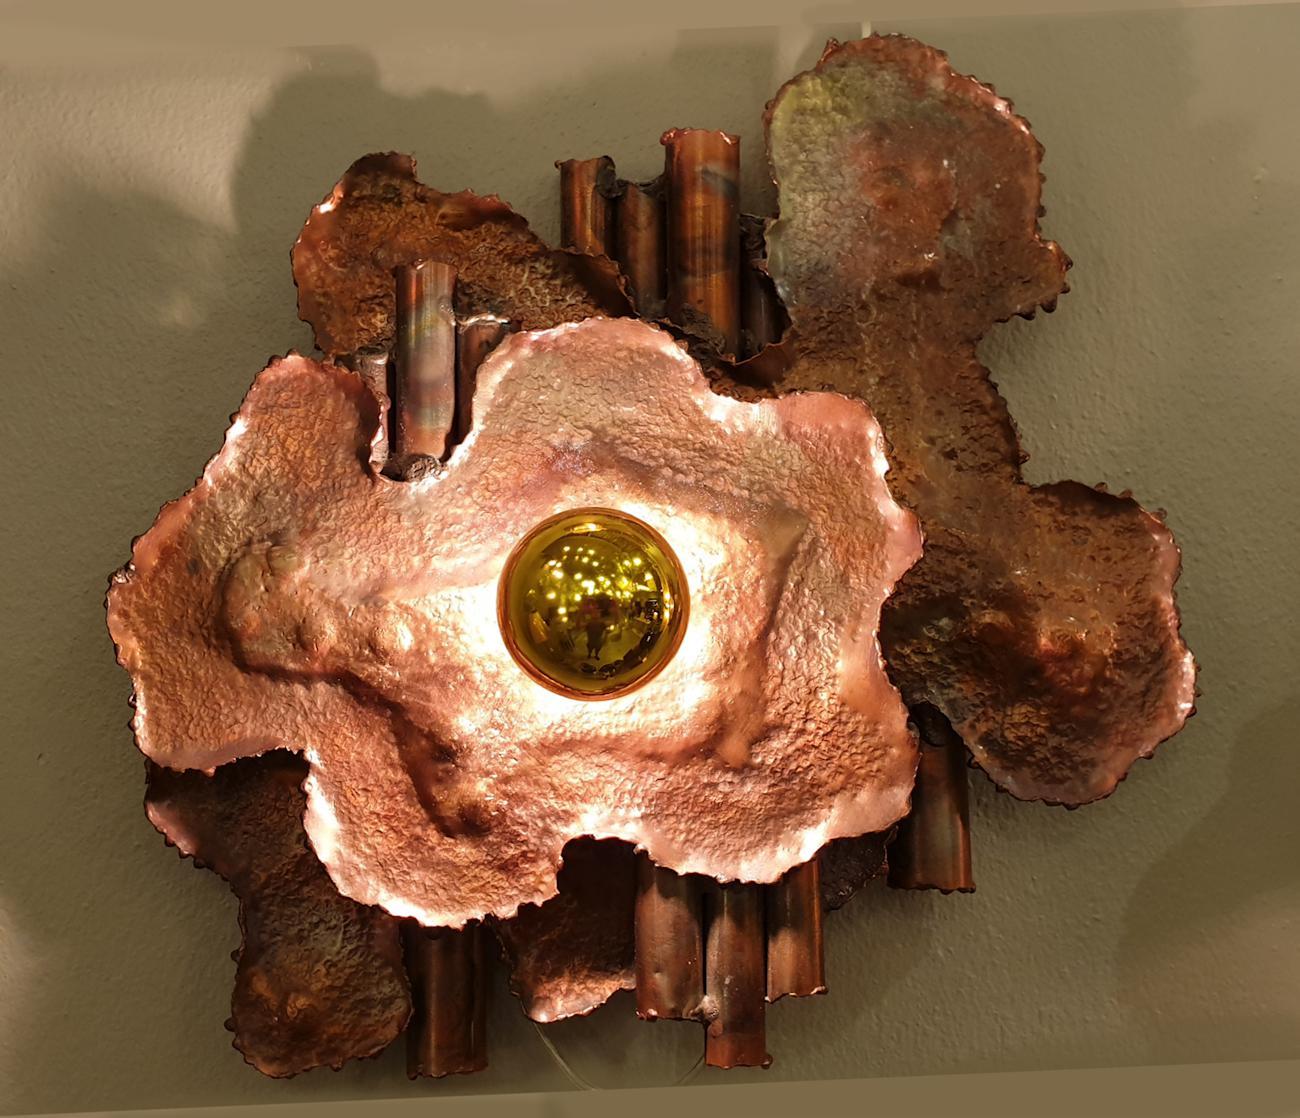 Mid-Century Modern Brutalist Copper Sconces, Italy 1970s ... on Mid Century Modern Sconces id=23124